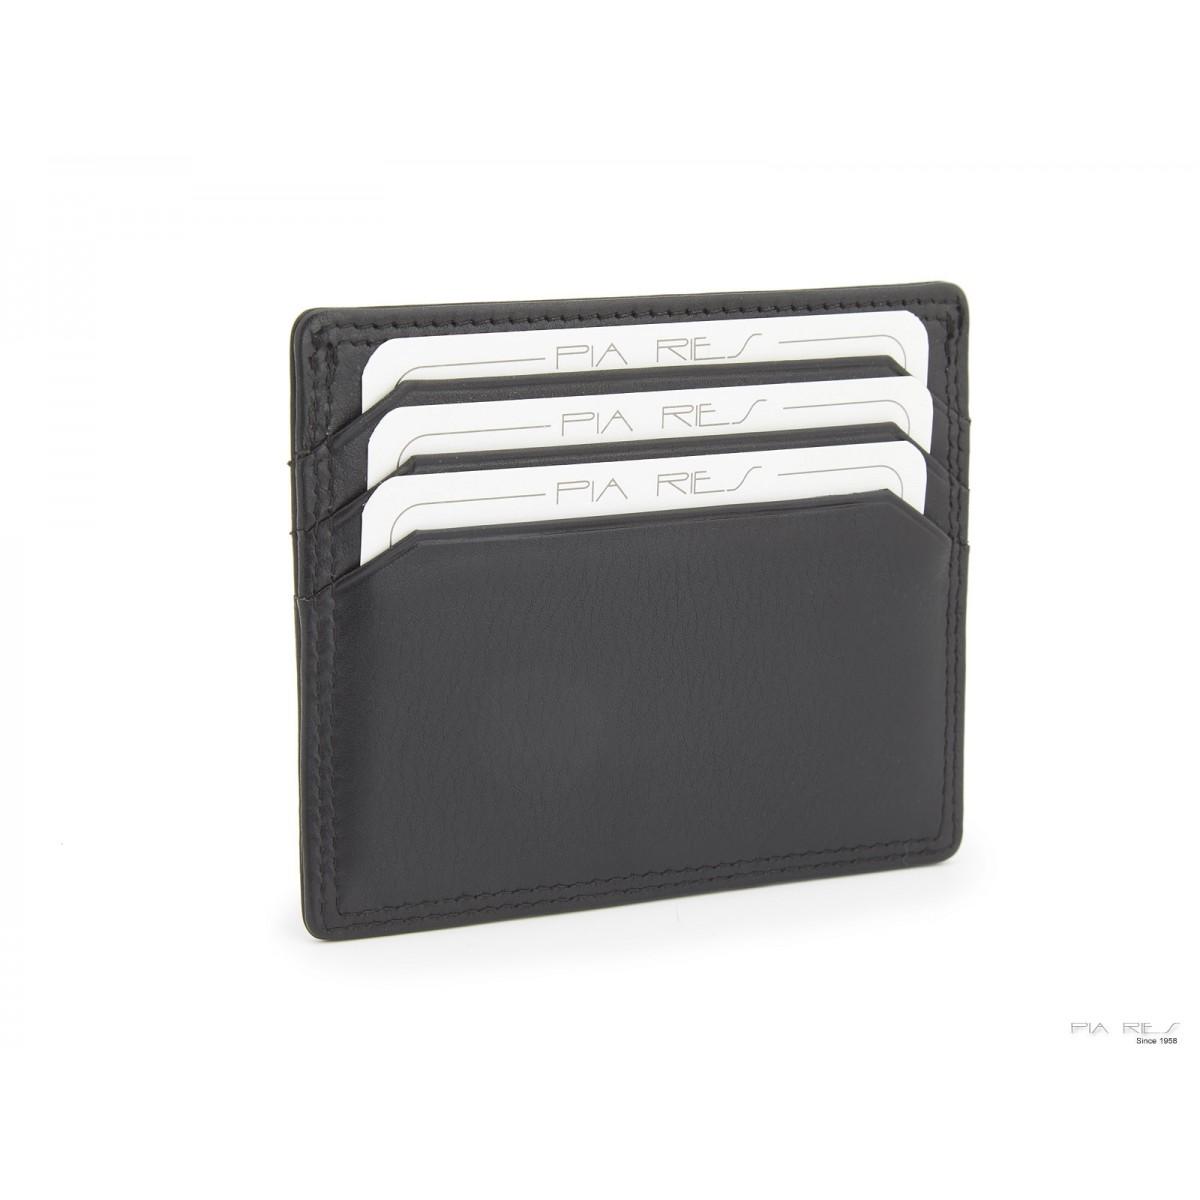 Kreditkortetuimedseddelrum-32